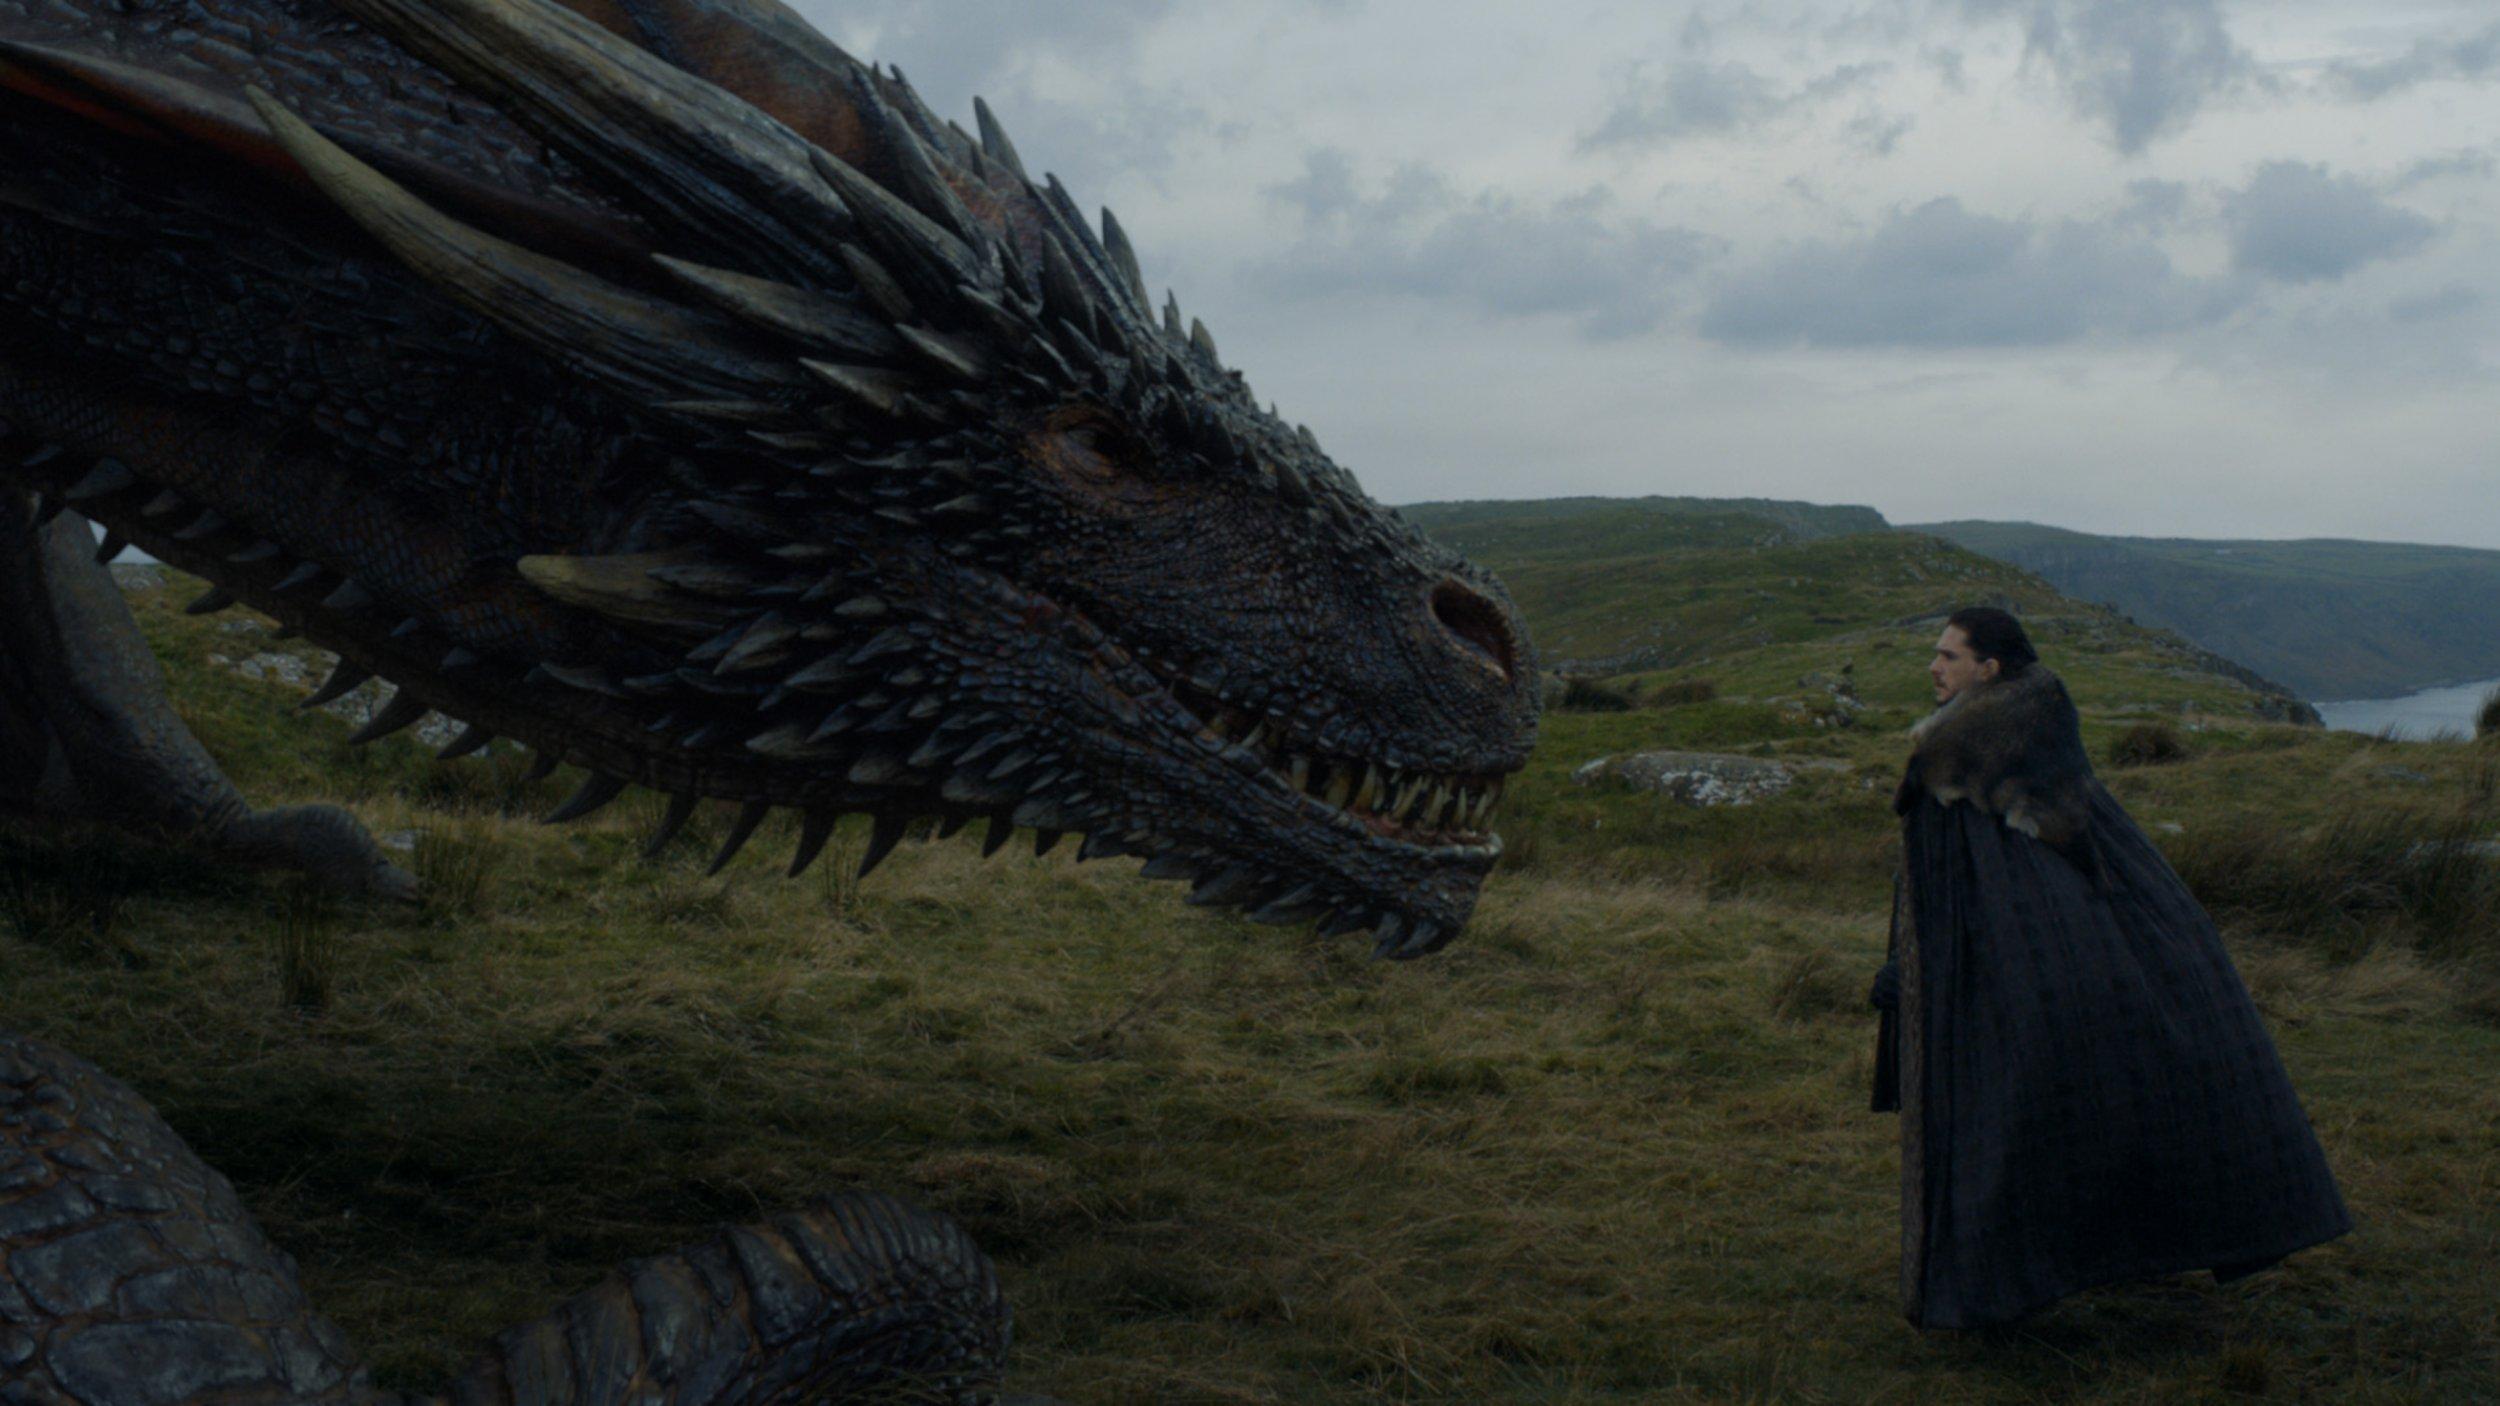 Game of Thrones - Jon Snow meets Drogon